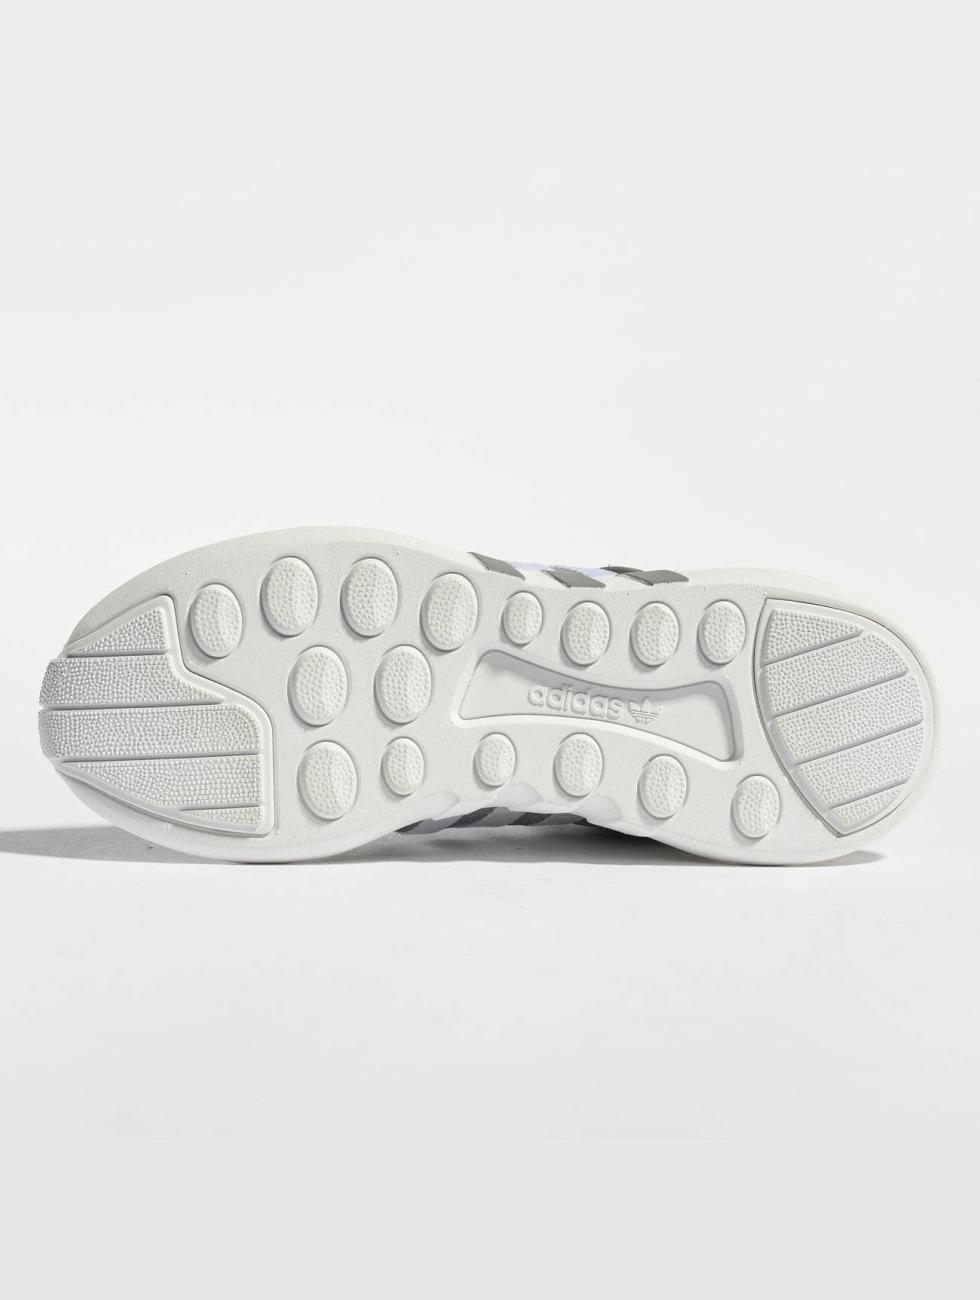 Adidas Originals Sko / Sneaker Eqt Support Adv Grå 498 630 Gratis Frakt Billig Rekkefølge Billig Den Billigste GFqhb9Fiv8